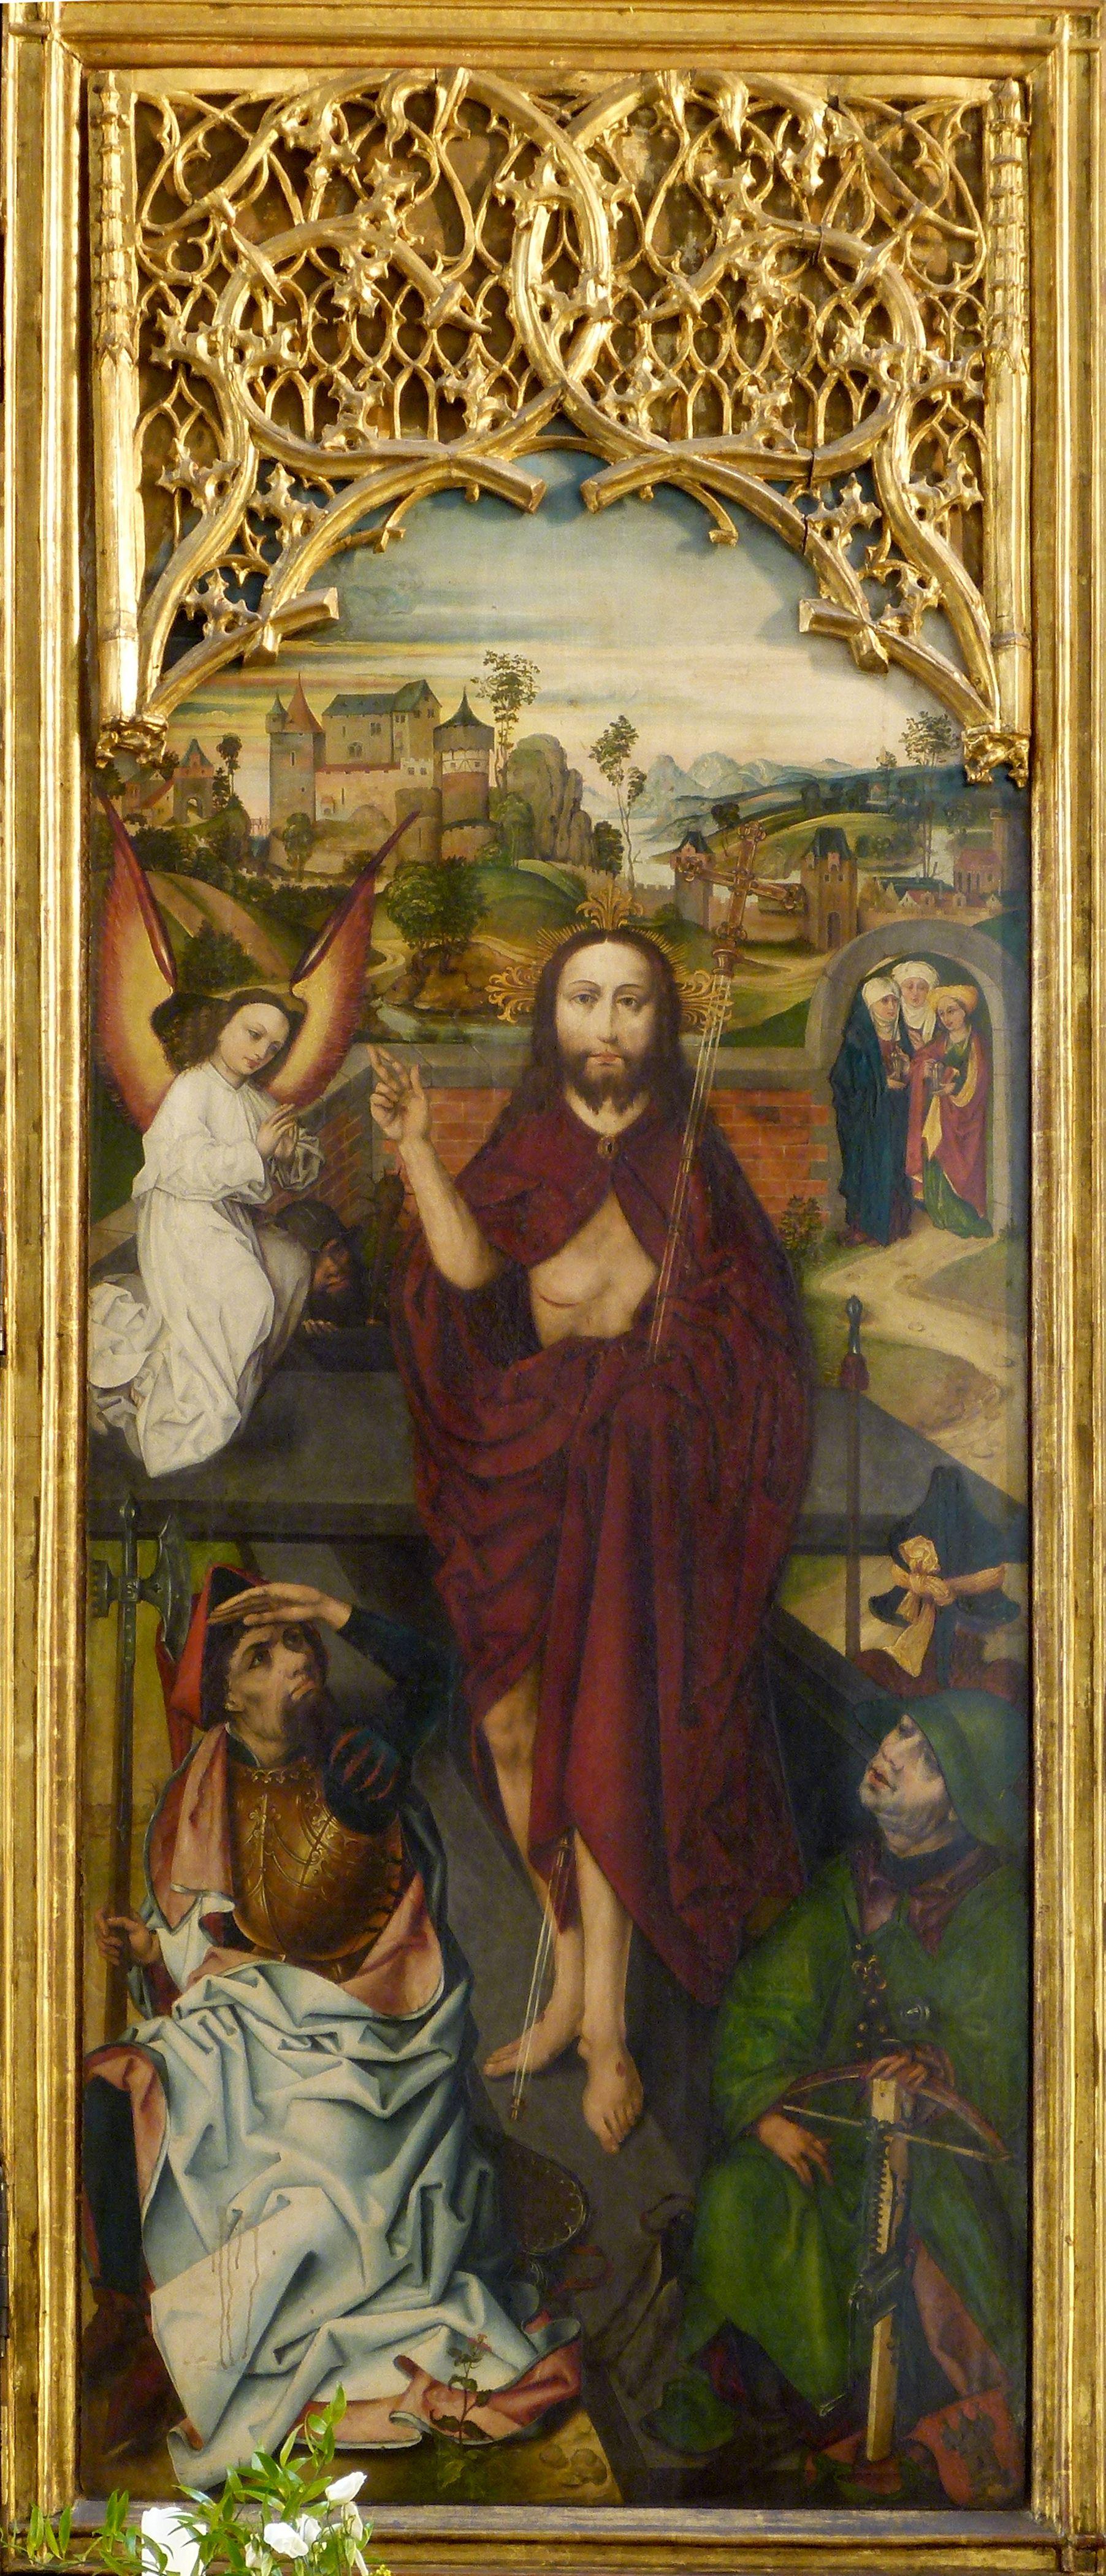 Peringsdörfer Altar Retabel im geöffneten Zustand, rechter Flügel: Auferstandener